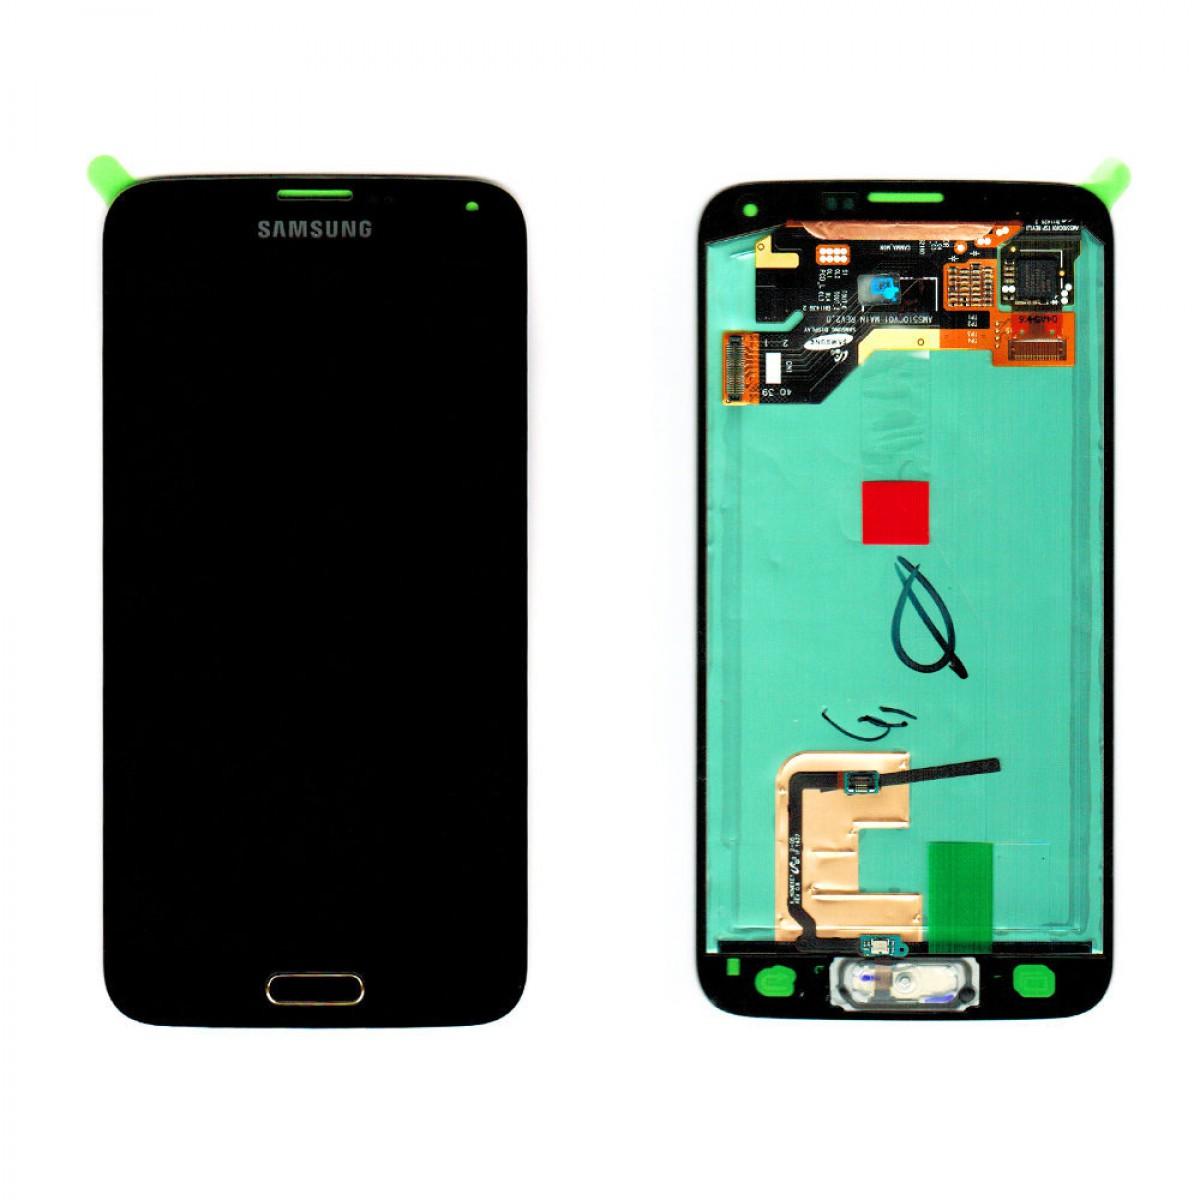 cran samsung galaxy s5 g900f or origine achat en ligne sur lcd maroc. Black Bedroom Furniture Sets. Home Design Ideas